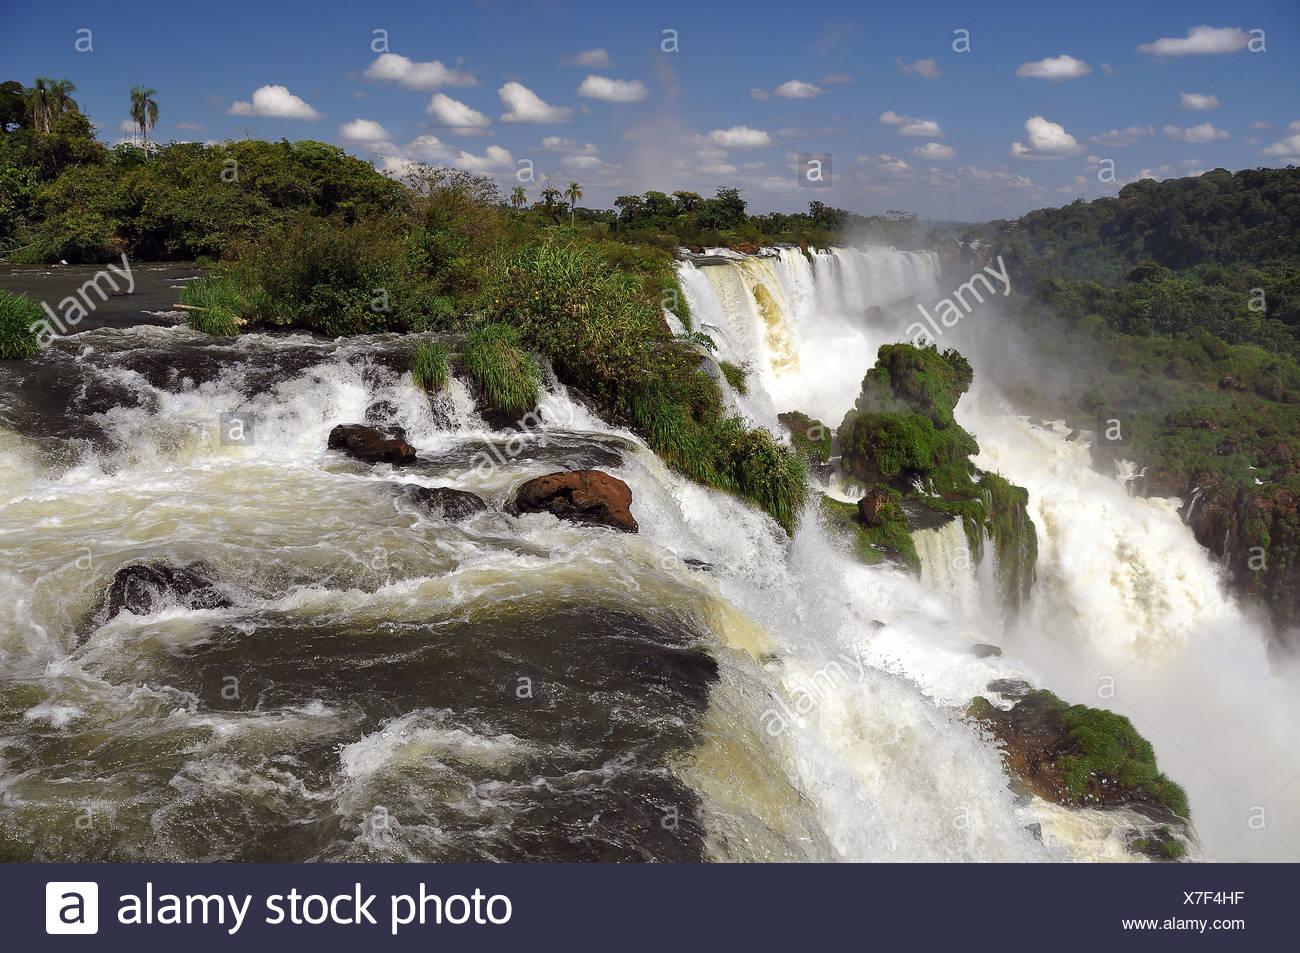 Cataratas del Iguazu, Iguazu Falls, Puerto Iguazu, Argentina - Brazil border, South America - Stock Image